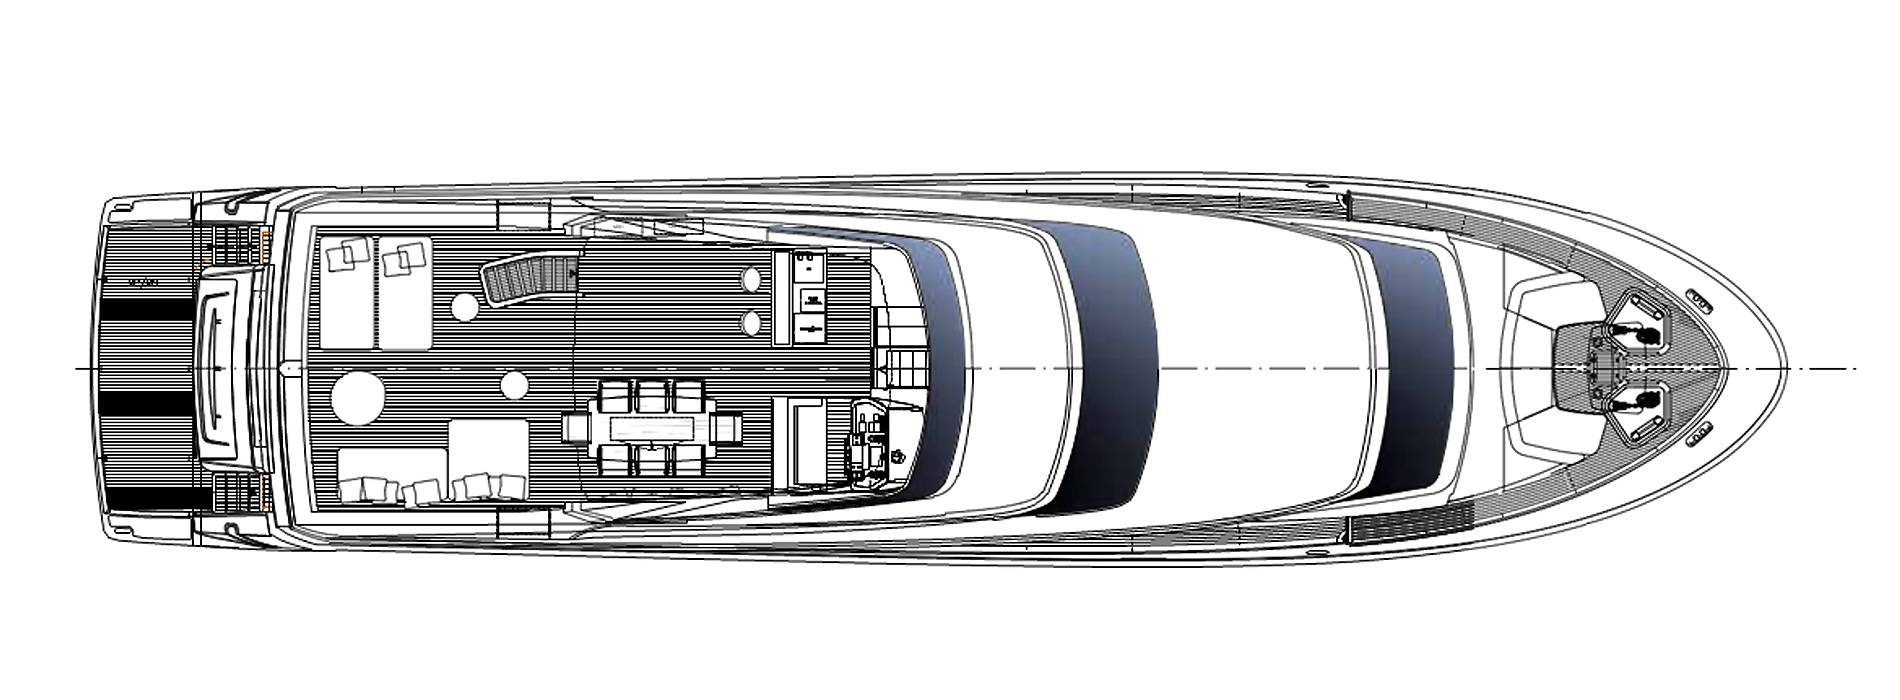 Sanlorenzo Yachts SL96-623 飞桥